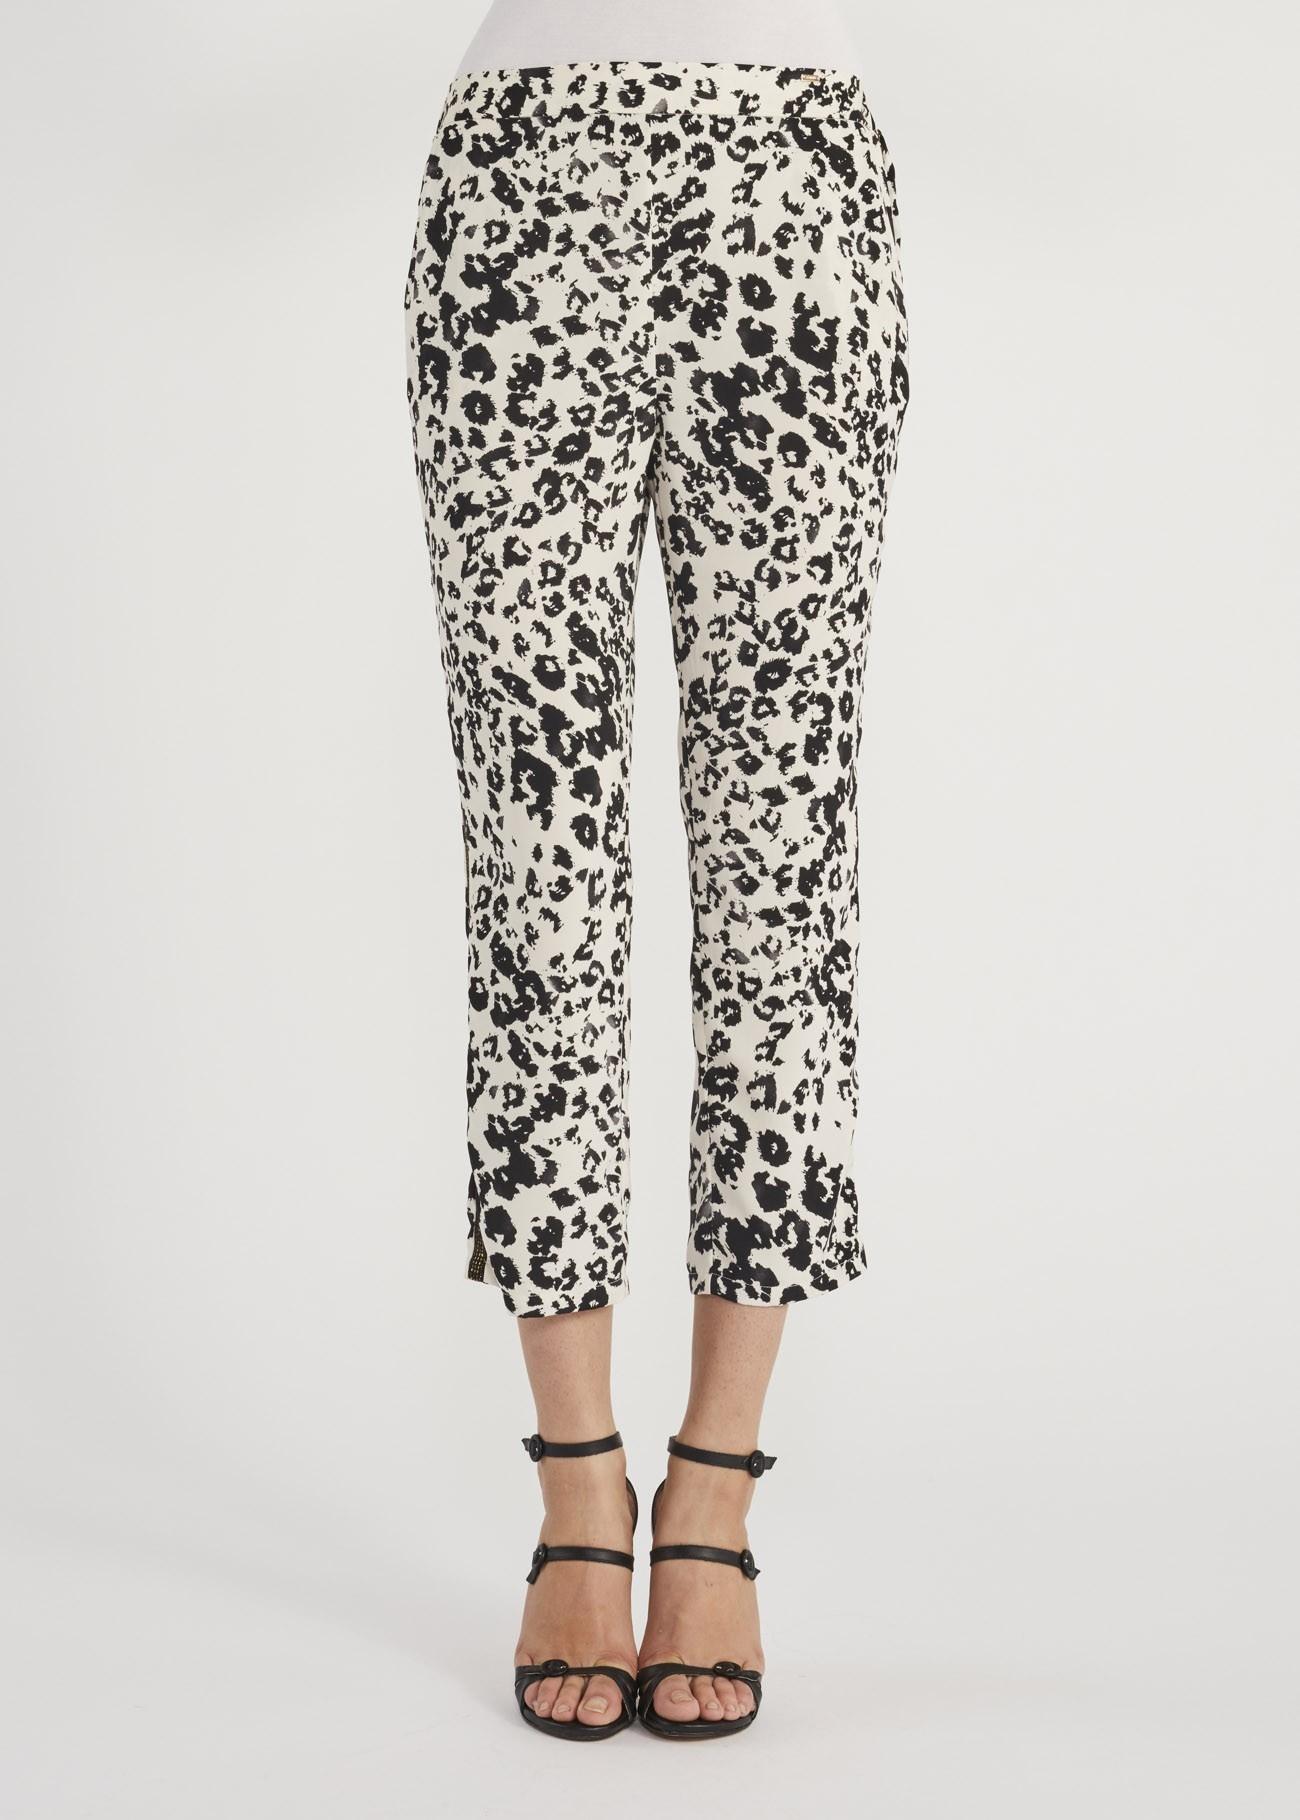 Pantaloni donna GAUDì animalier bianchi/neri